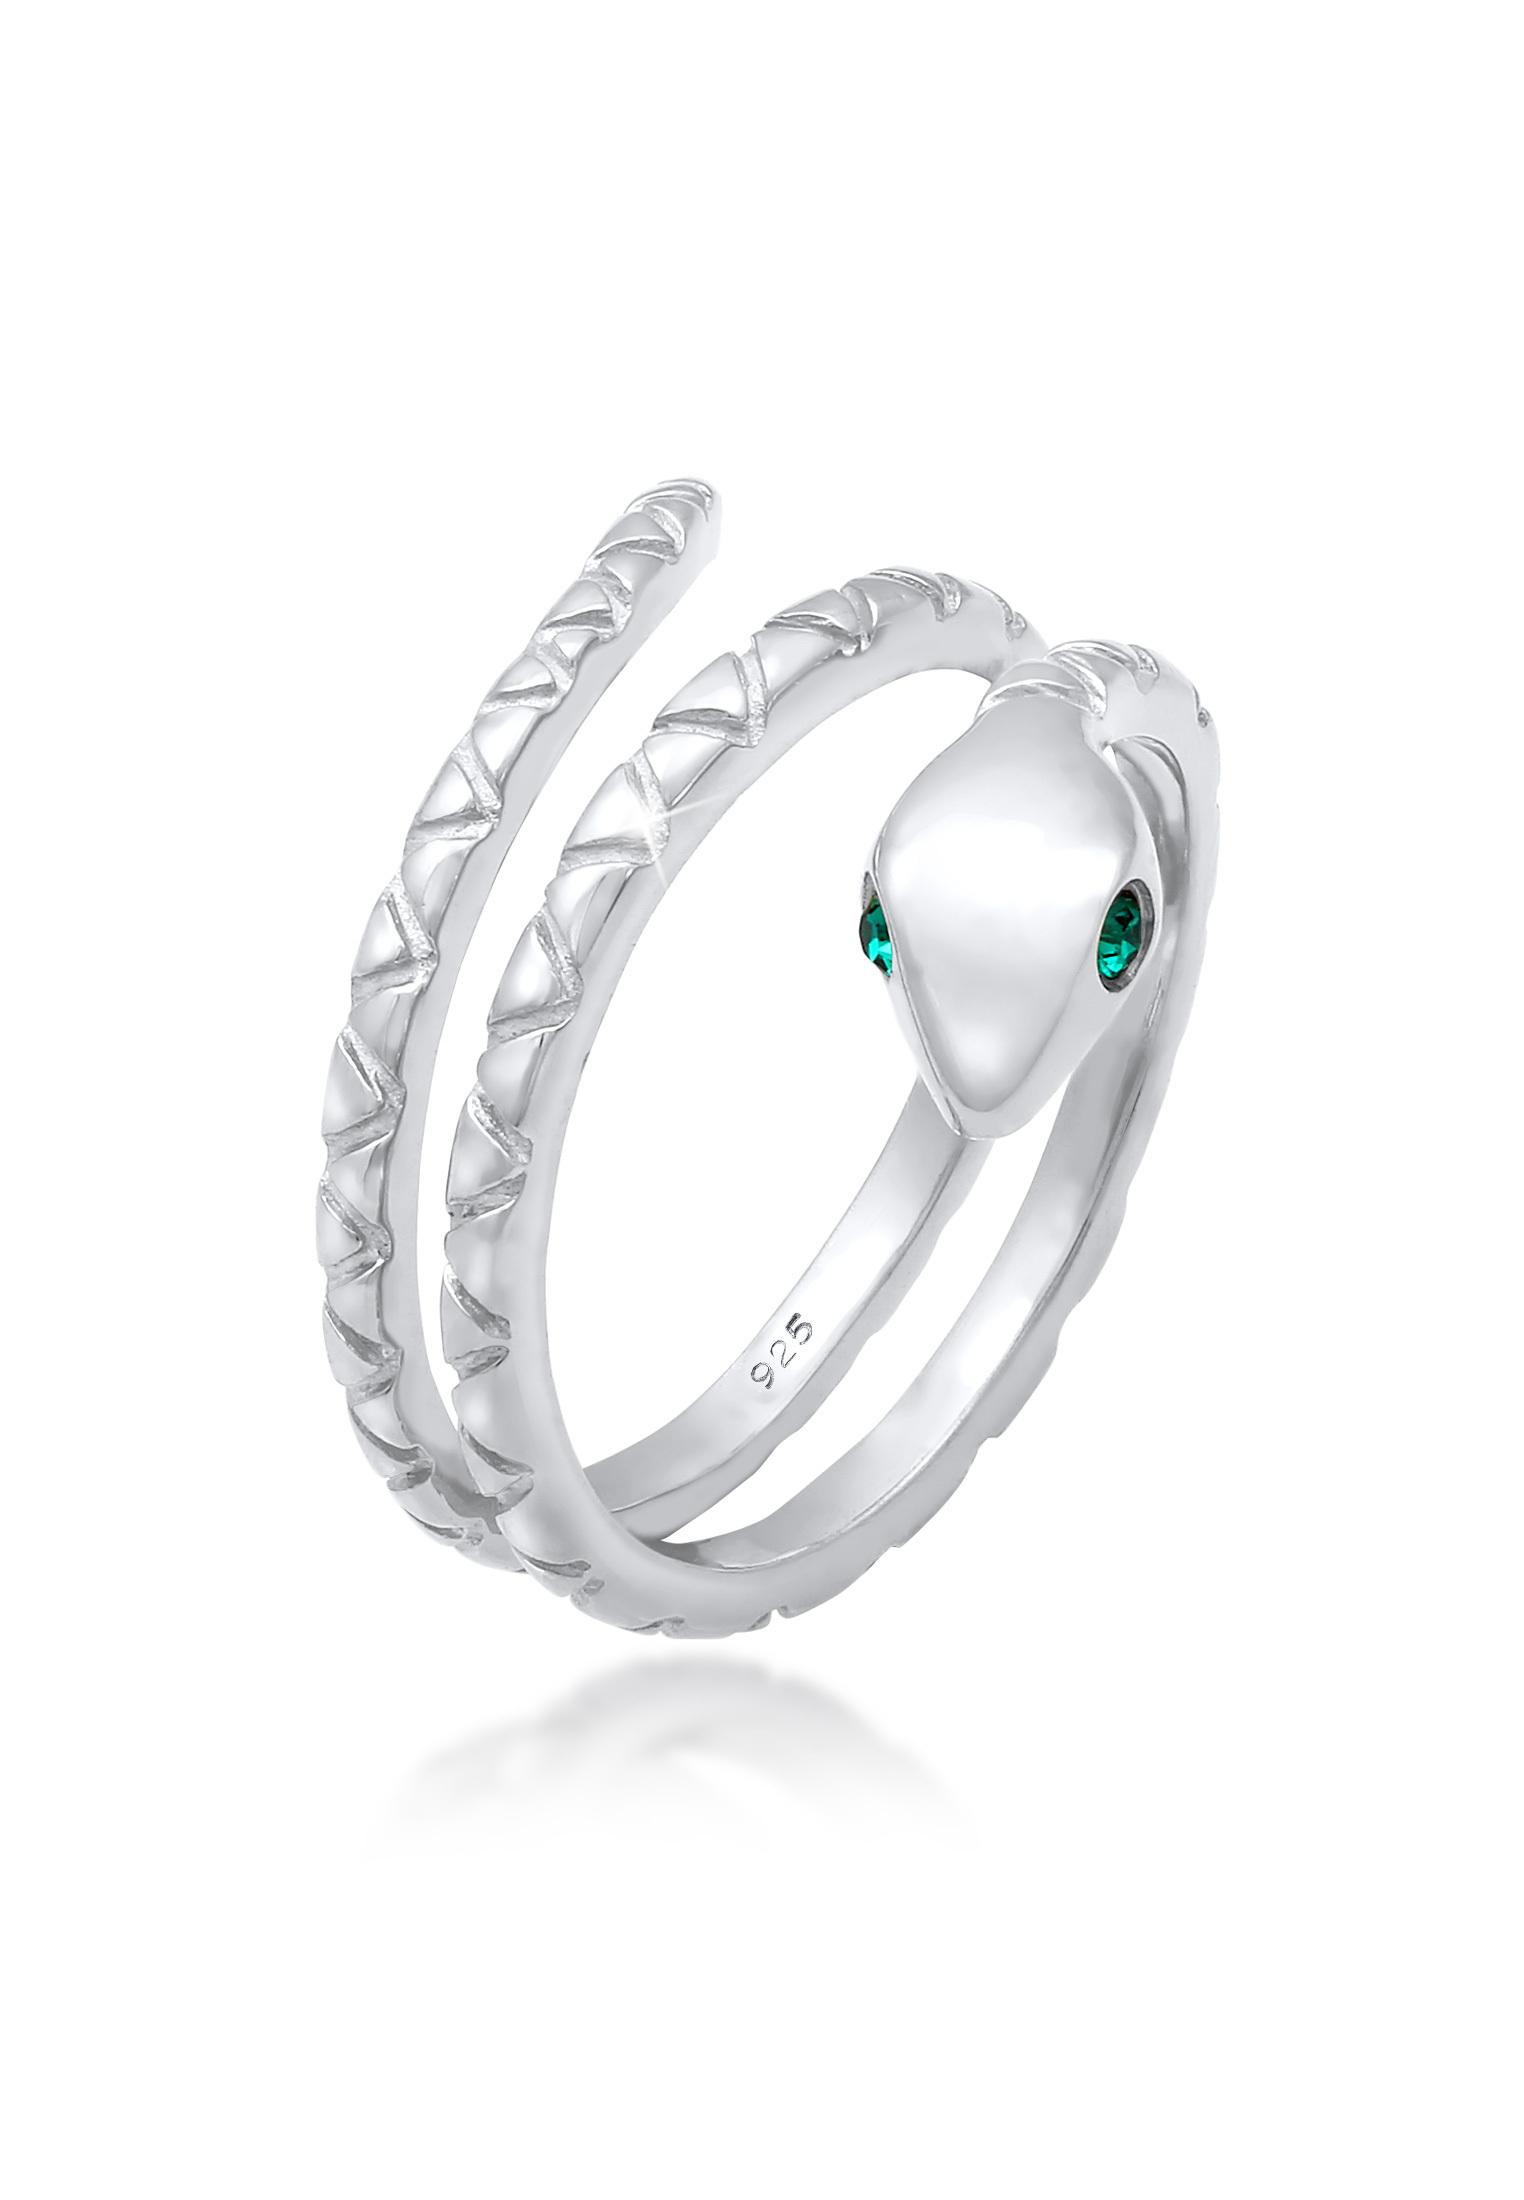 Pinky Ring Schlange   Kristall (Grün)   925 Sterling Silber